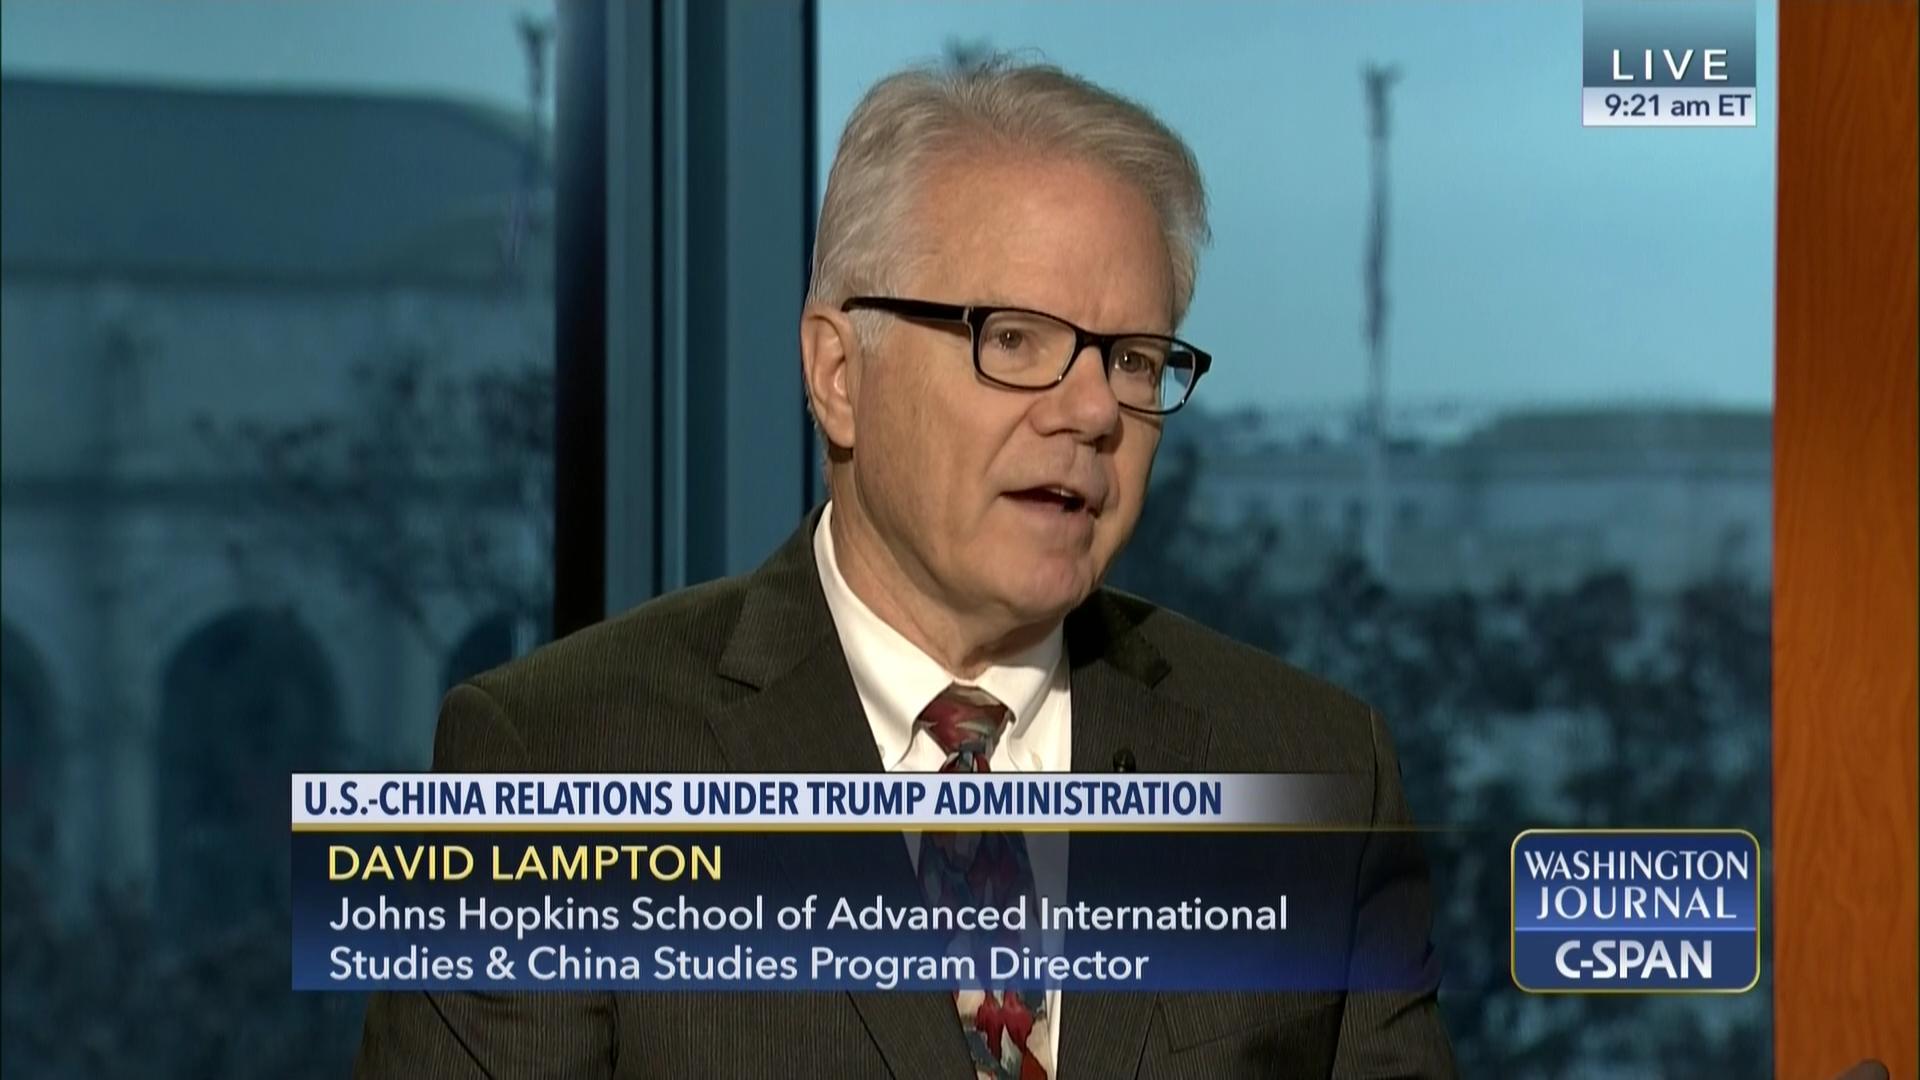 cf52aca419 David Lampton on U.S.-China Relations in the Trump Administration ...